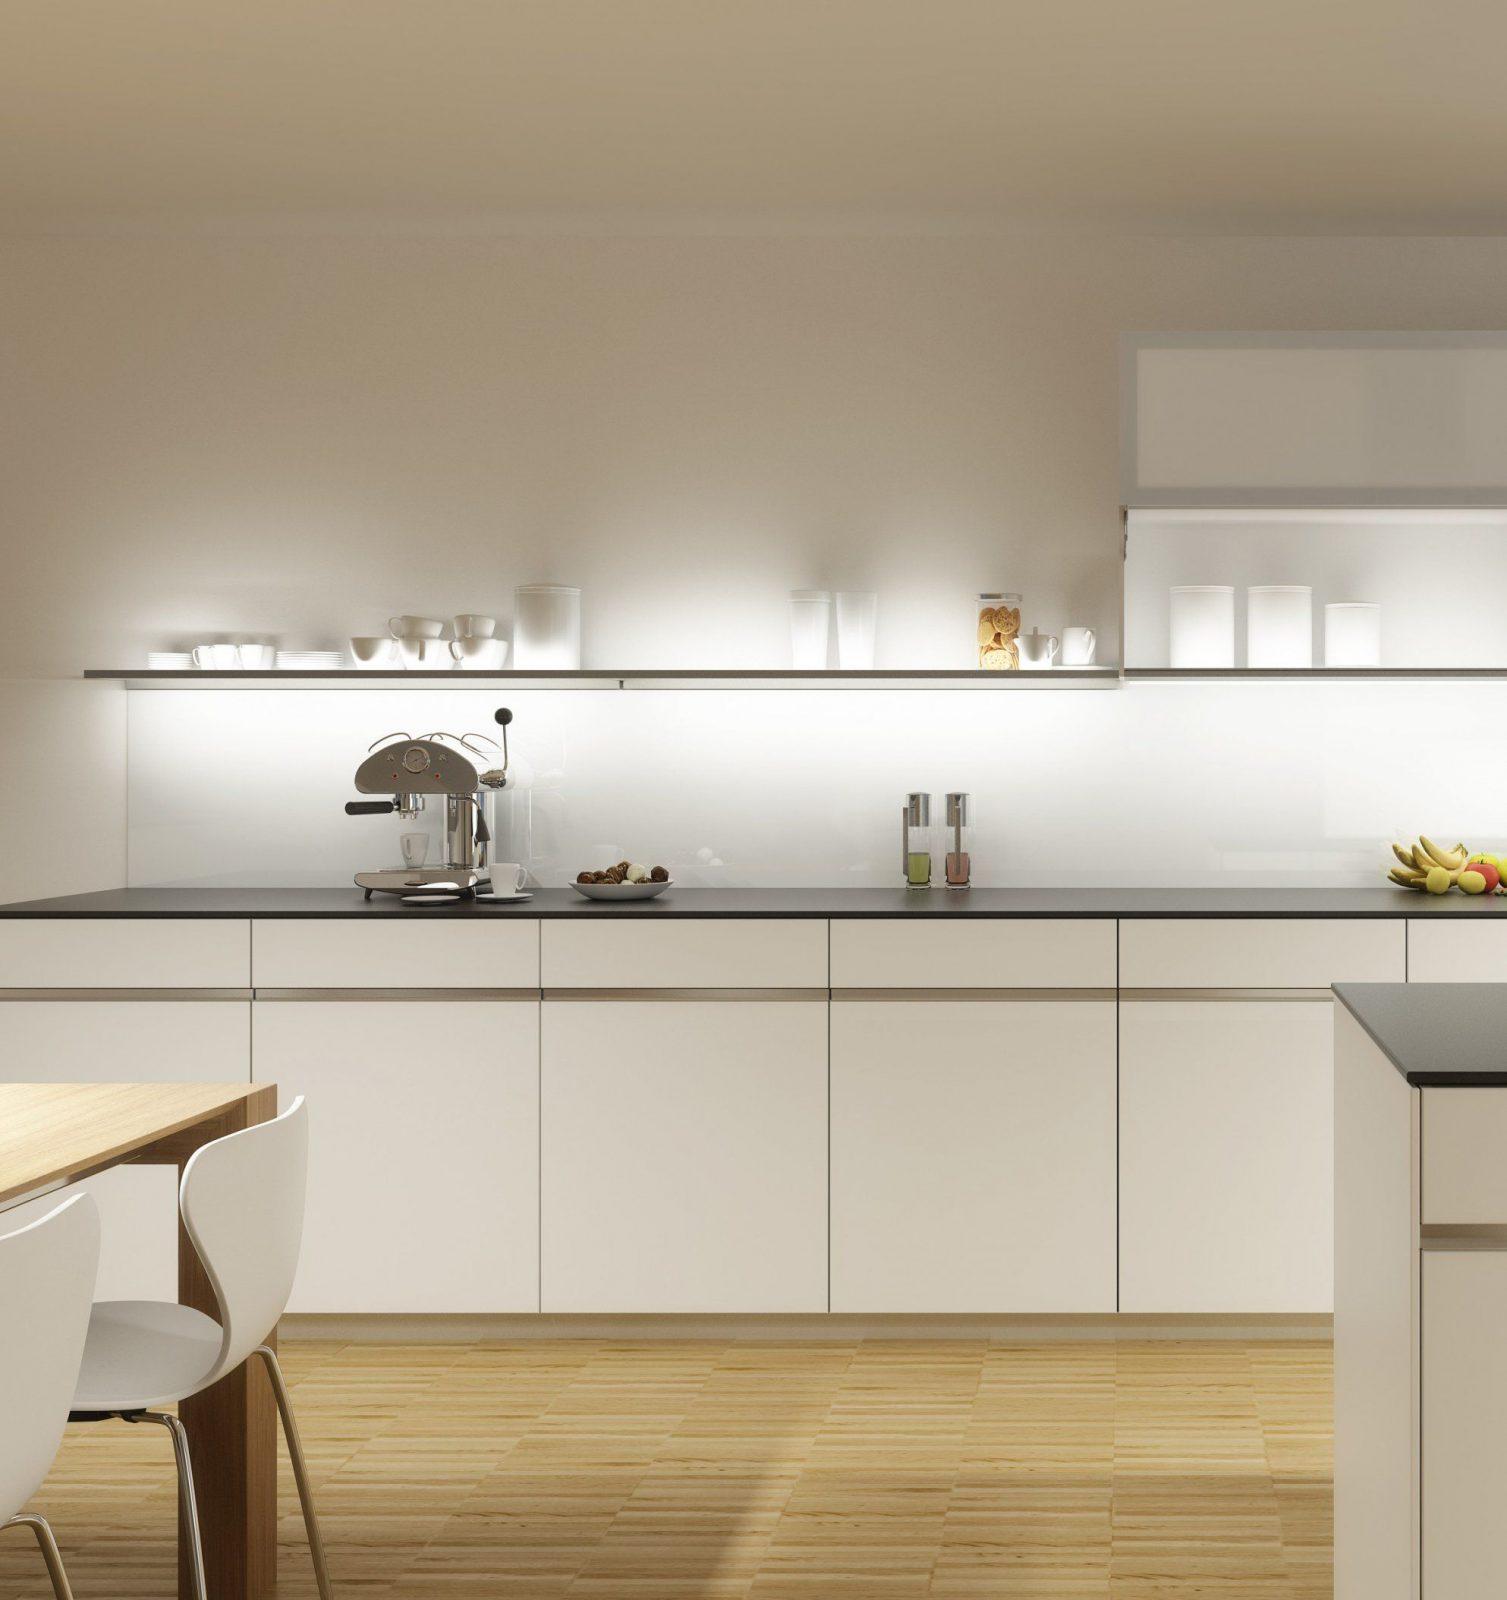 Beleuchtung Küche Ohne Oberschränke Küchenzeile von Beleuchtung Küche Ohne Oberschränke Photo